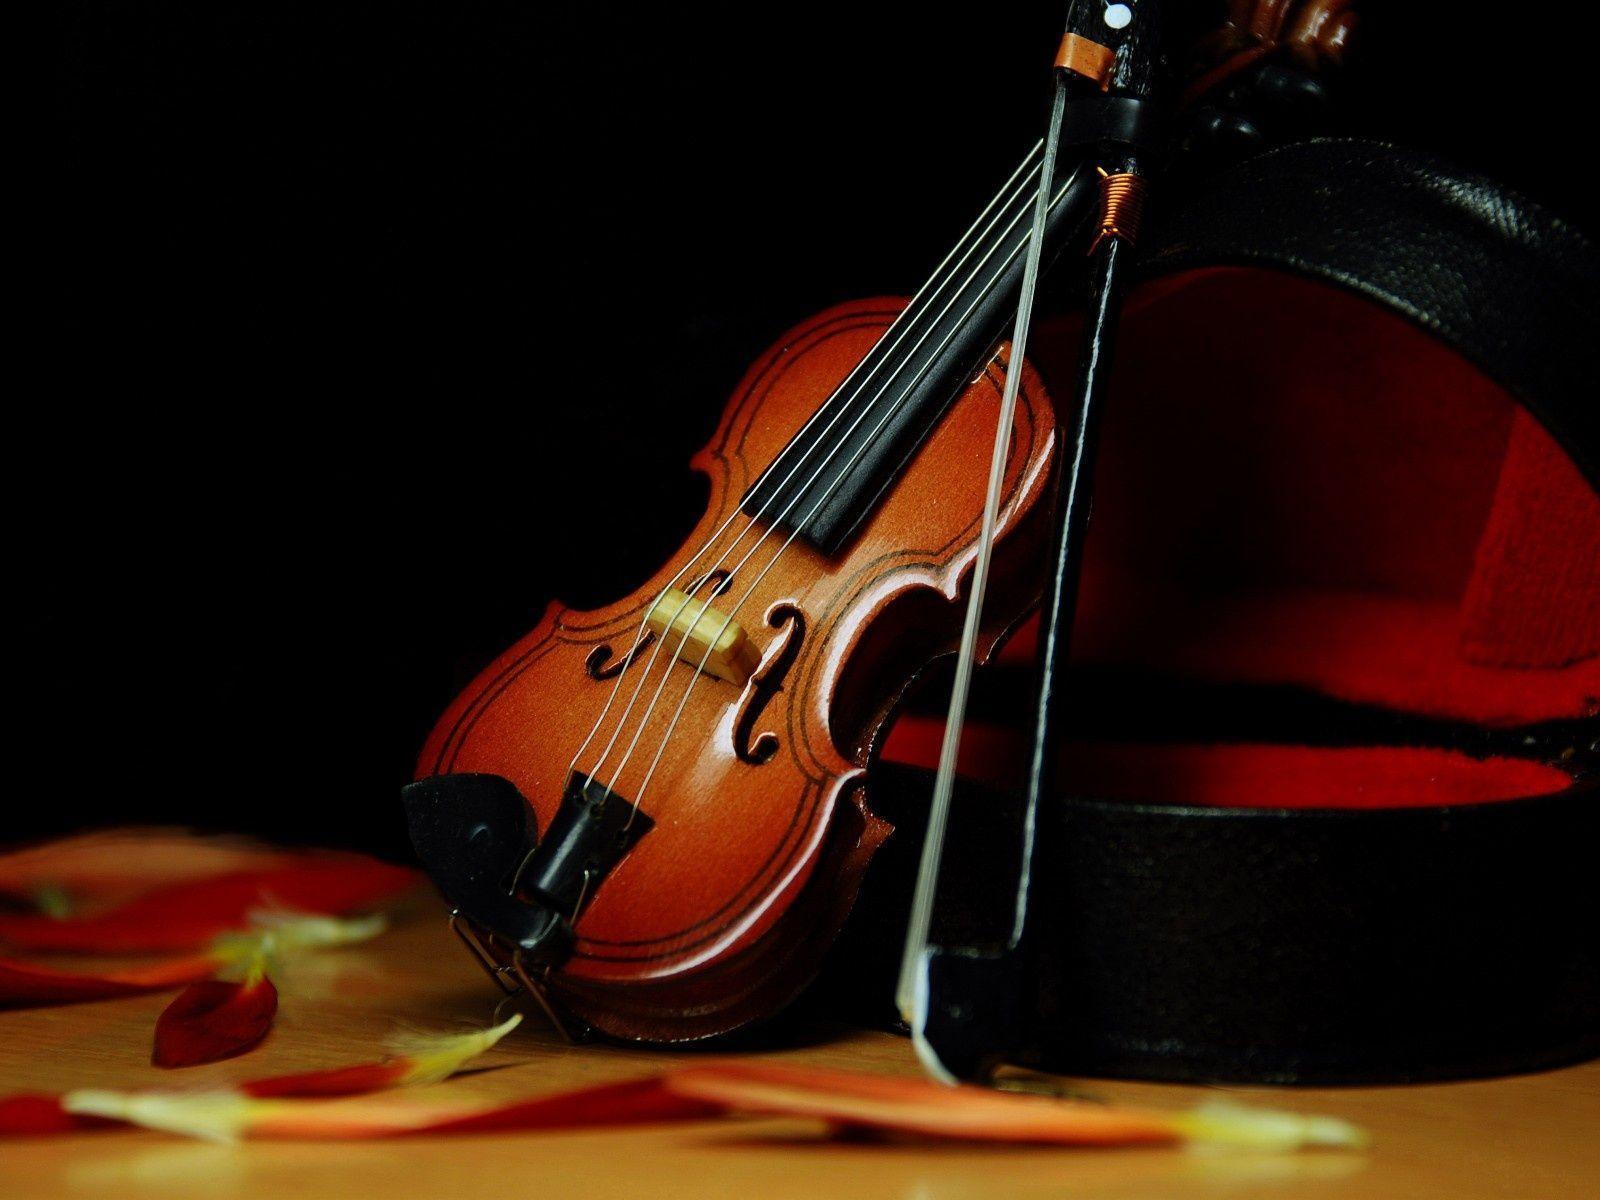 Violin Wallpaper Download 24655 | Wallpapers Photo